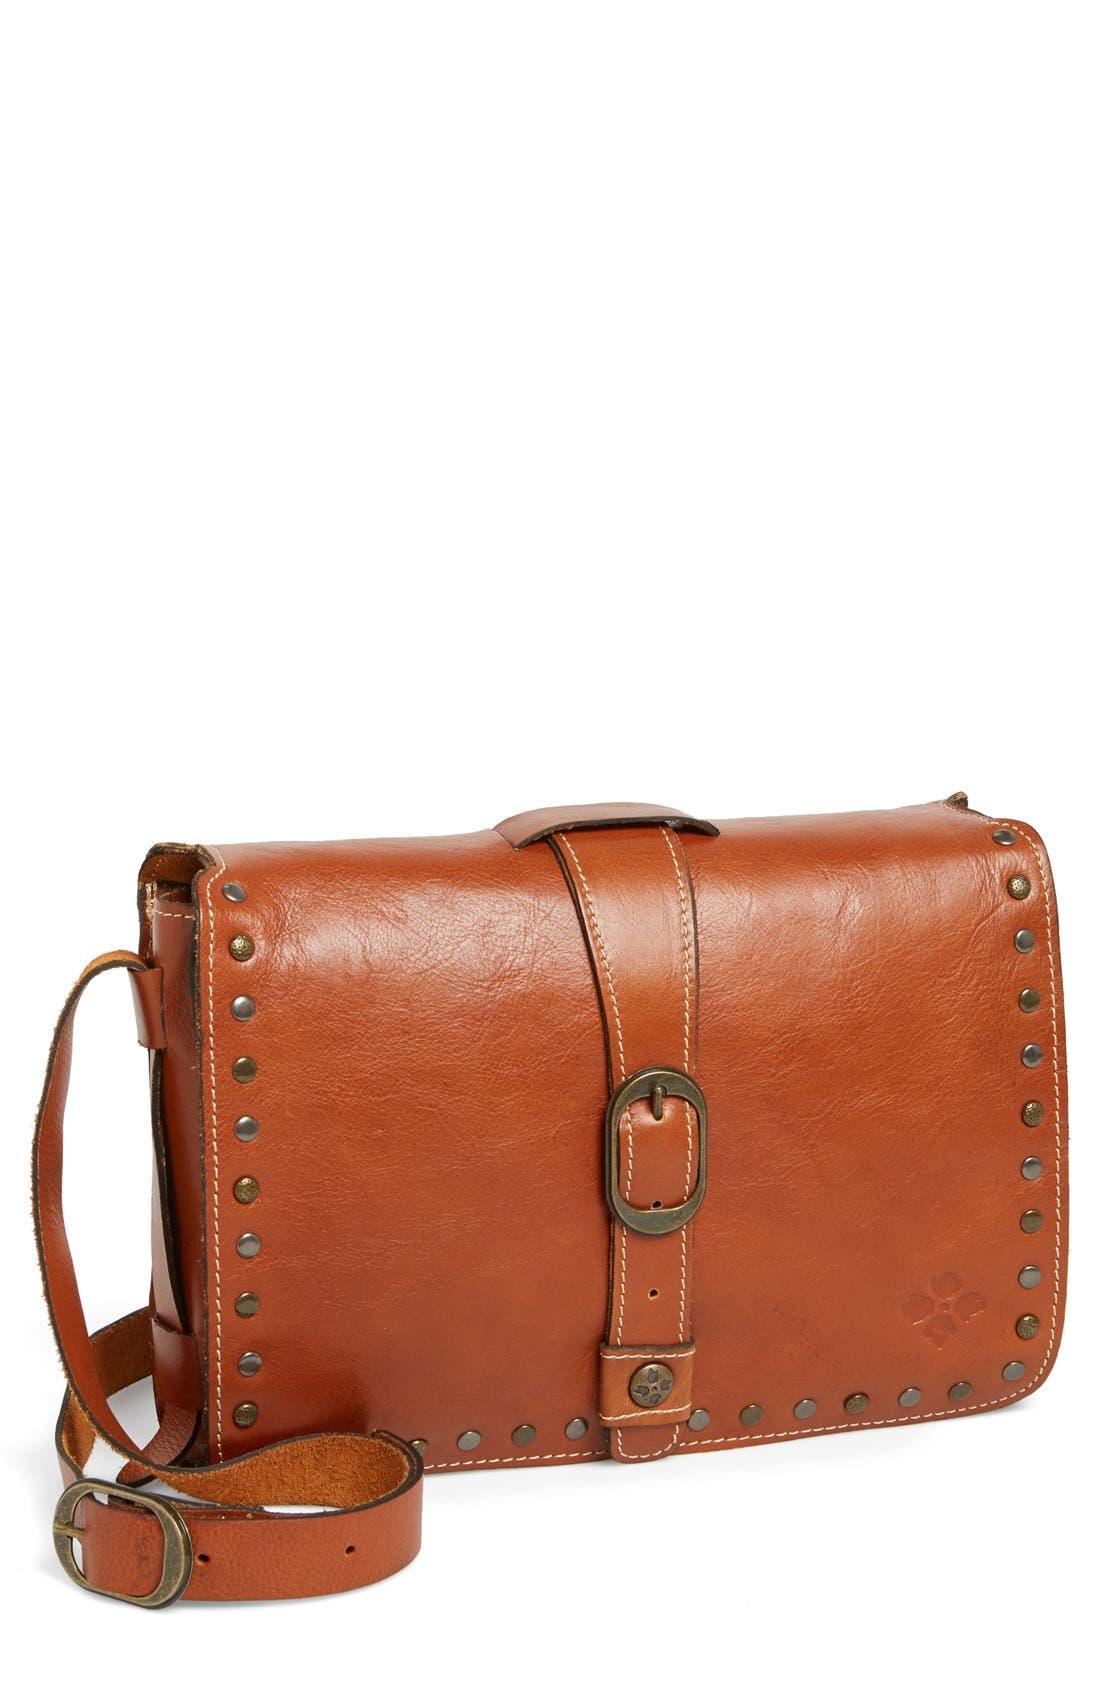 Main Image - Patricia Nash 'Mantova' Leather Crossbody Bag